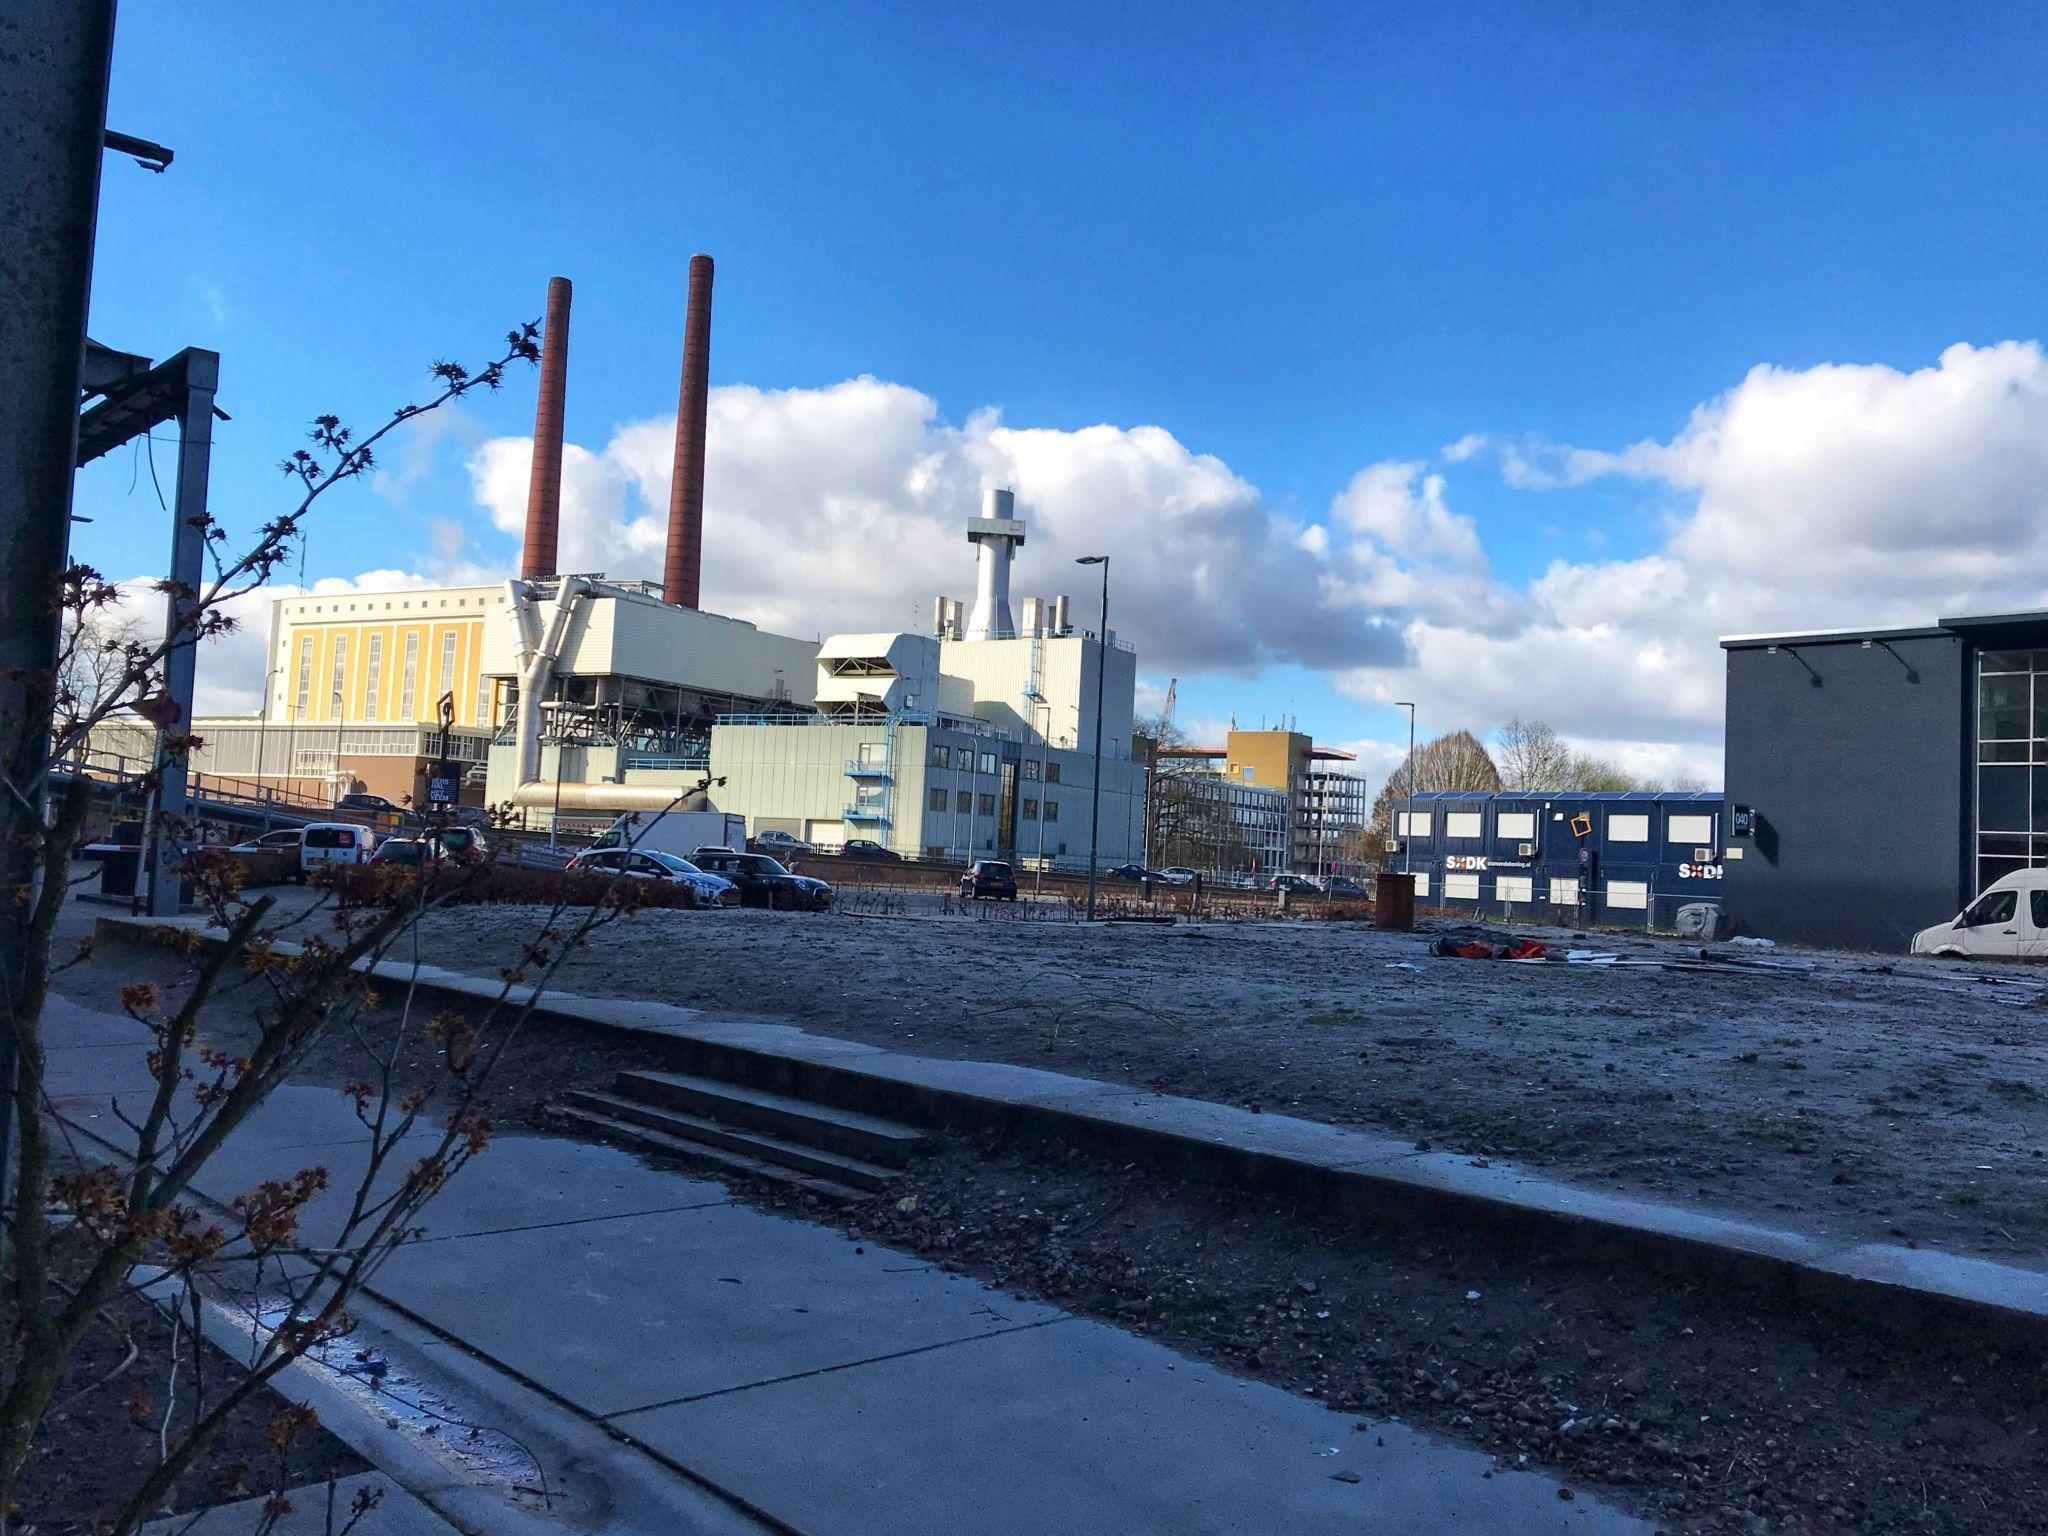 Industrial landscape in Eindhoven